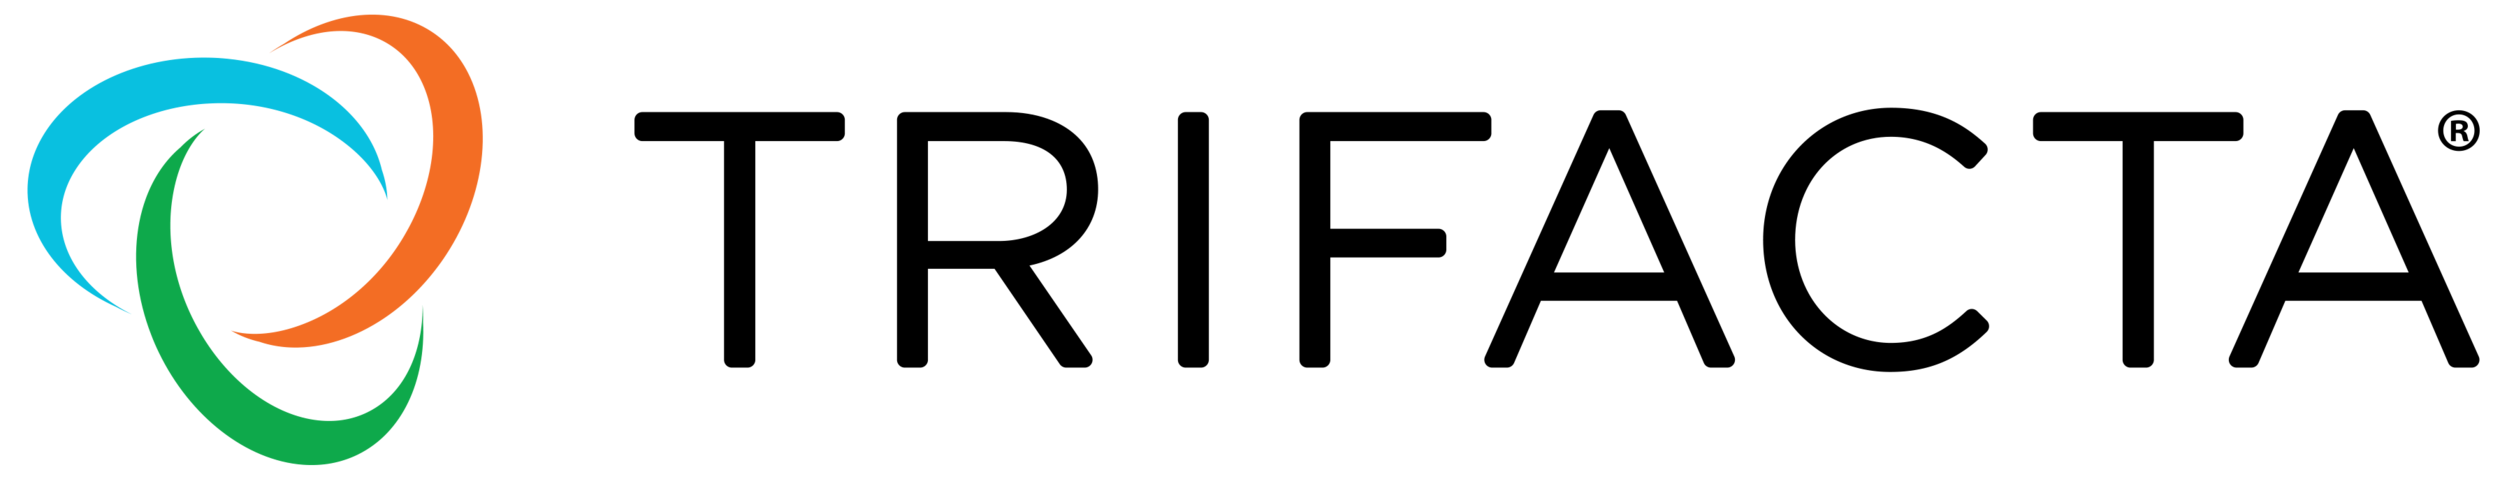 Trifacta-Logo-Horiz-RGB-2016.png